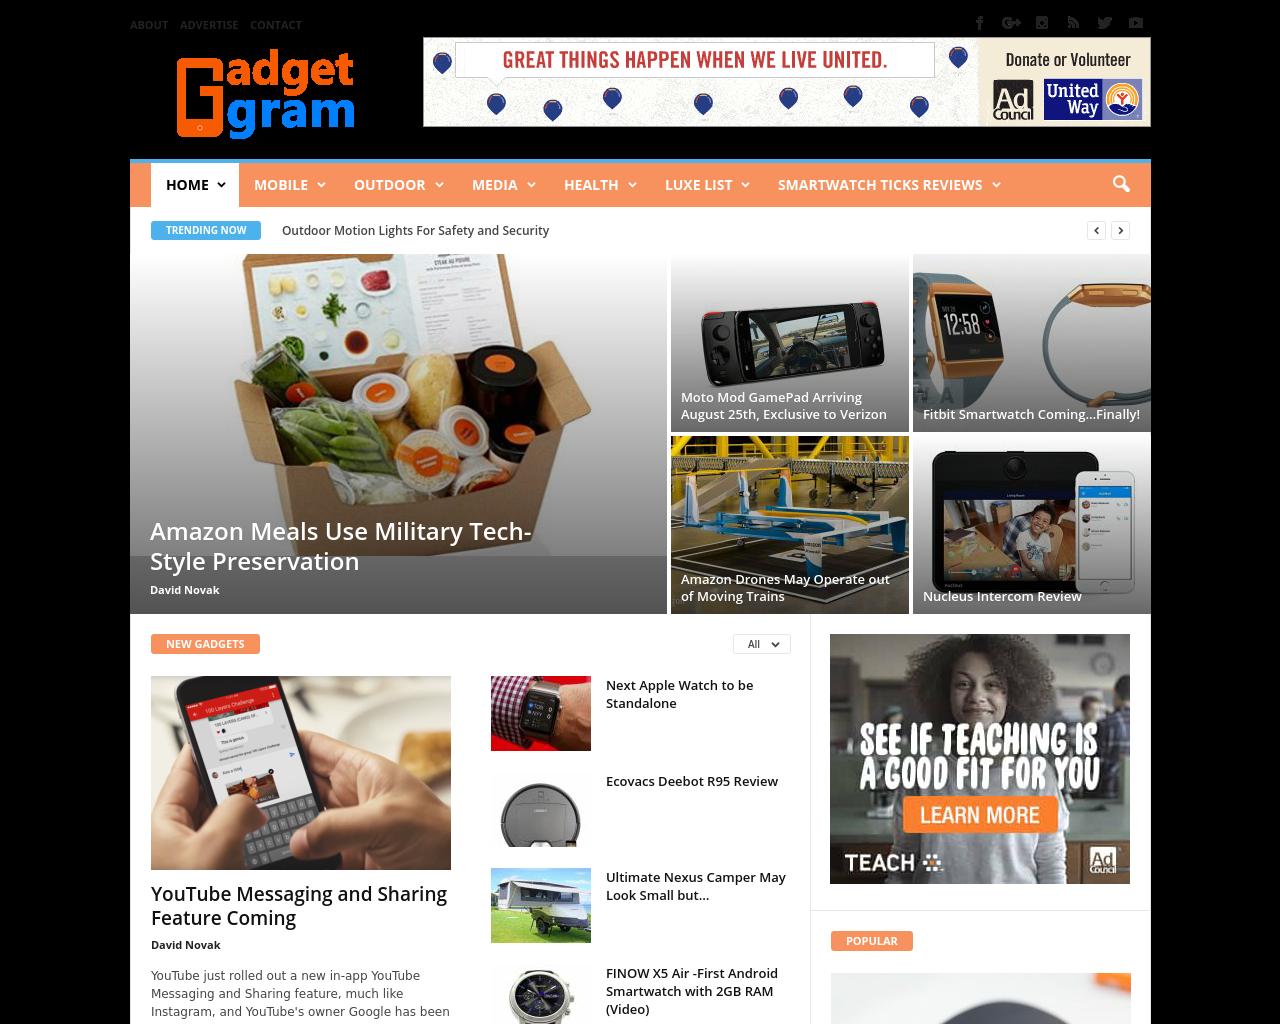 Gadget-Guy-Advertising-Reviews-Pricing